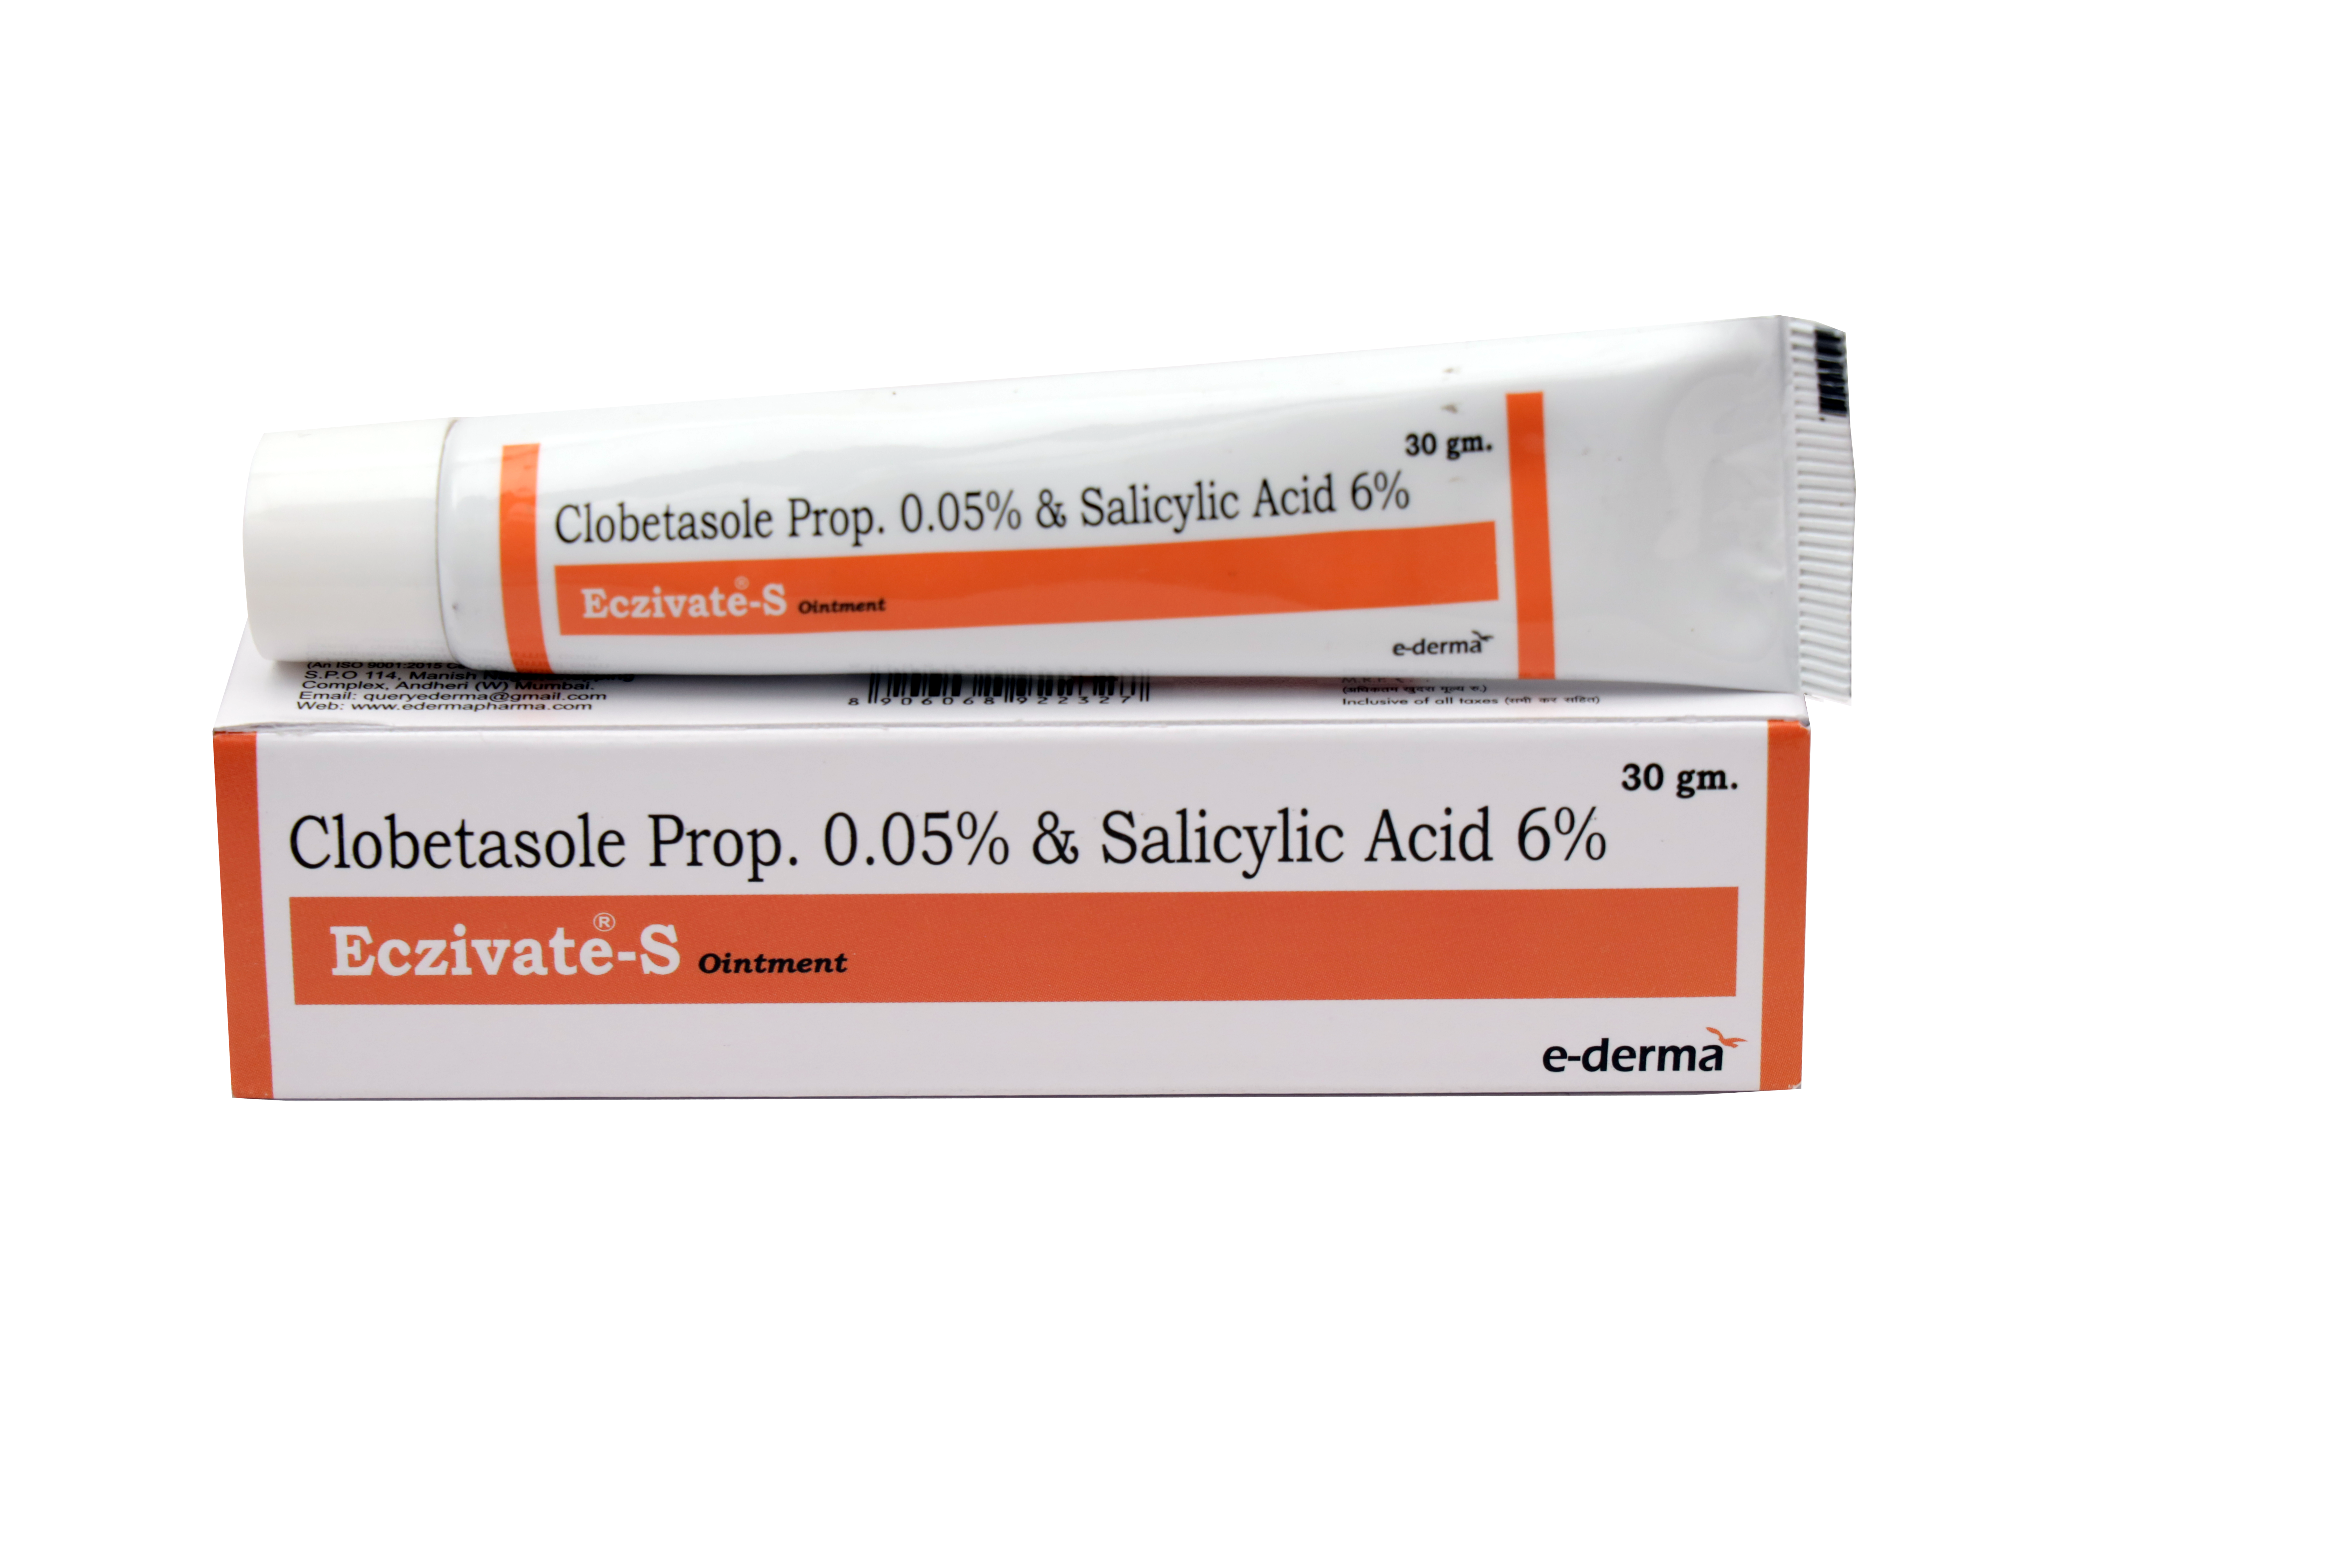 Clobetasol Propionate Lotion With 3/6% Salicylic Acid